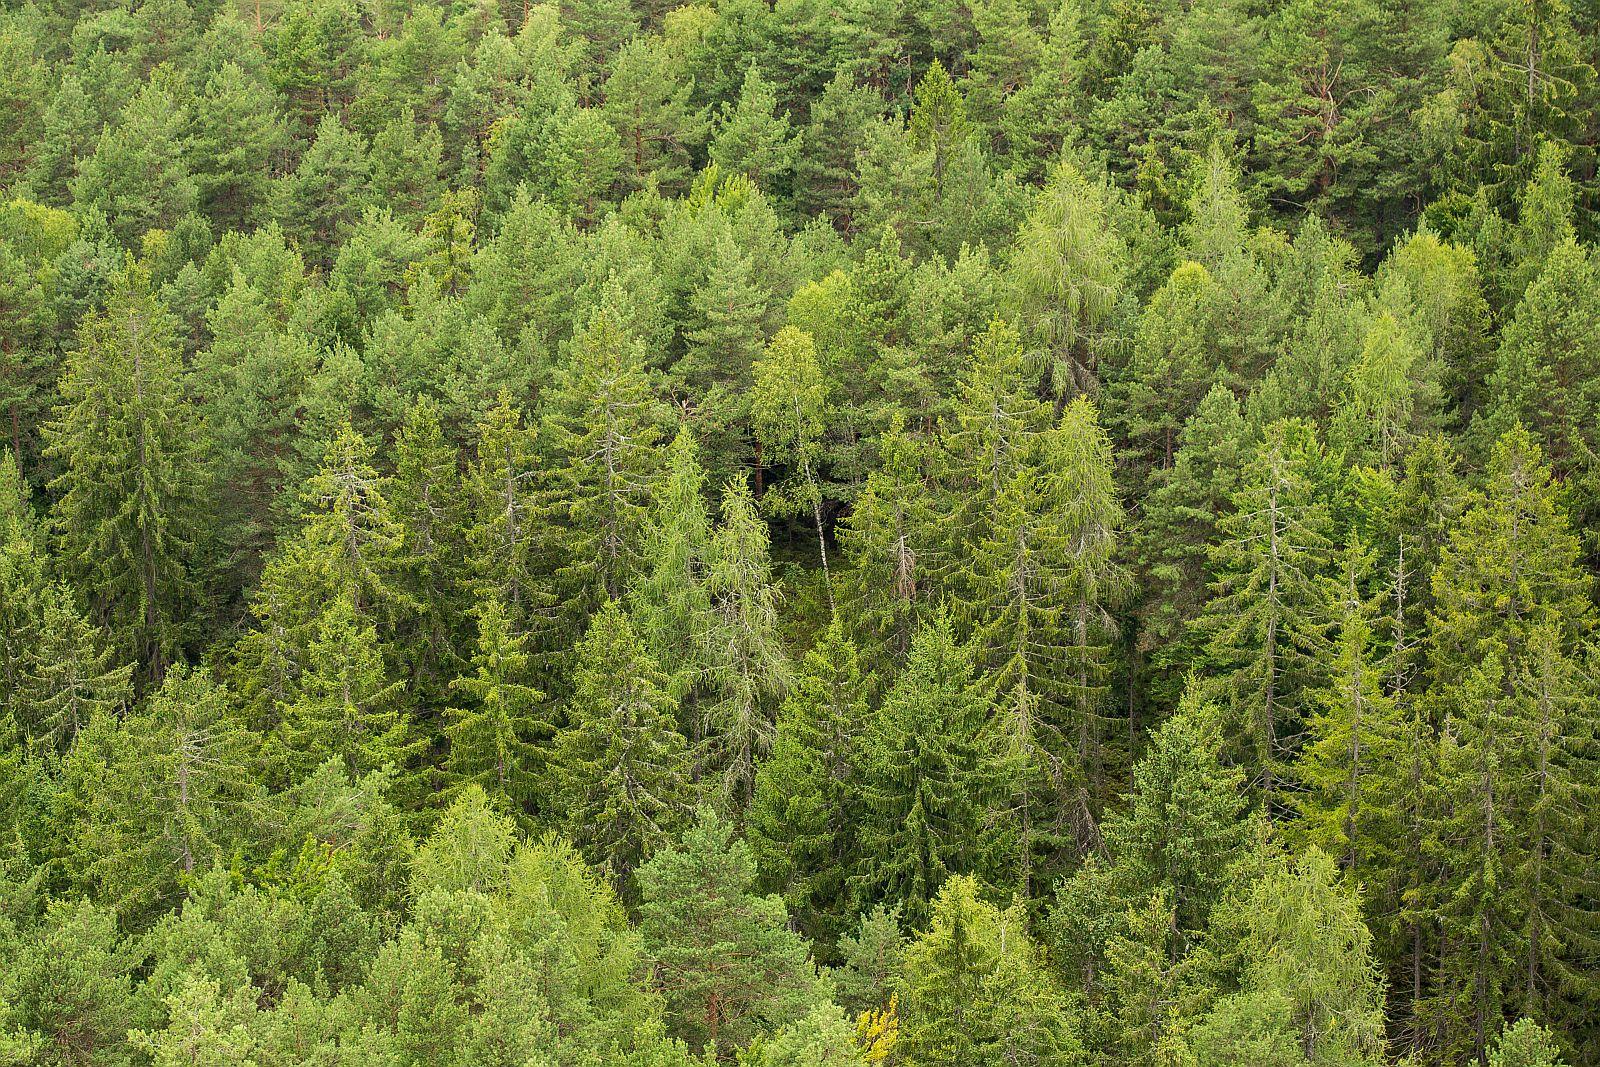 green-green-forest-trees-picjumbo-com